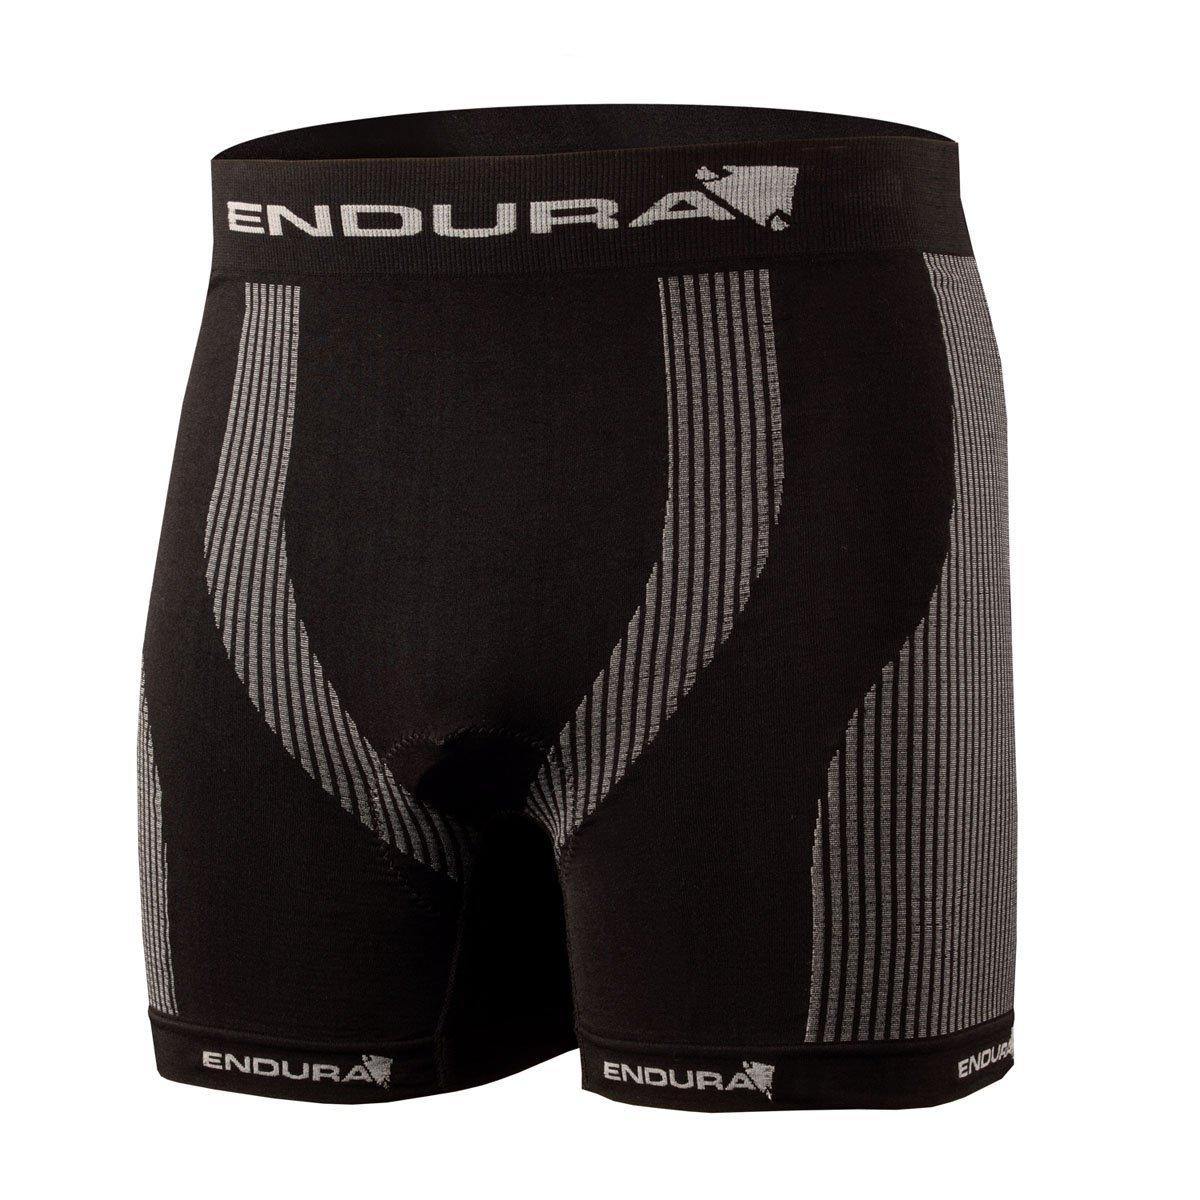 Endura Engineered Padded Cycling Underwear Liner Short Boxer